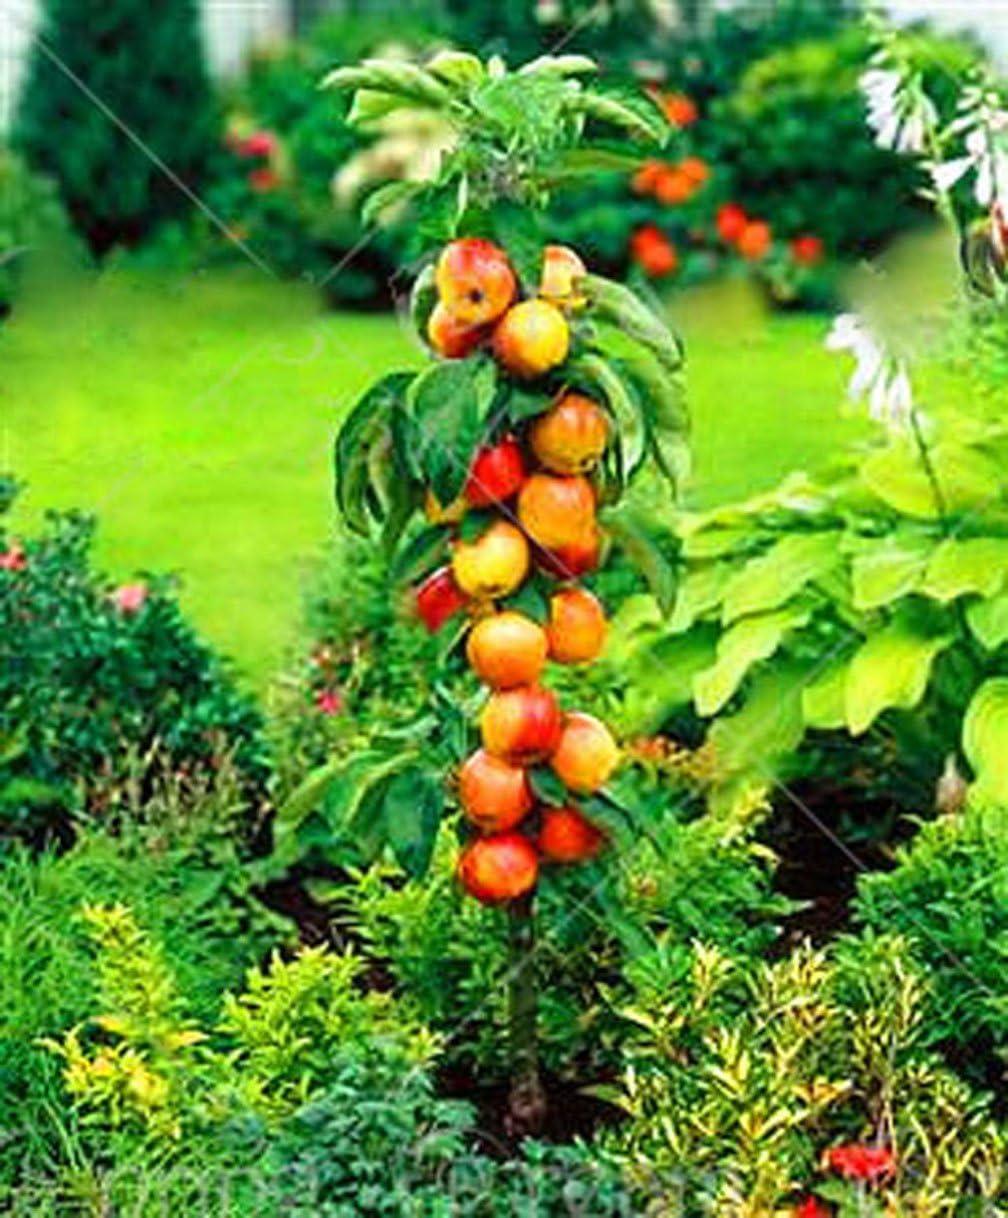 30pcs/Bag Dwarf Apple Seeds Miniature Apple Tree Sweet Organic Fruit Vegetable Seeds Indoor or Outdoor Plant for Home Garden